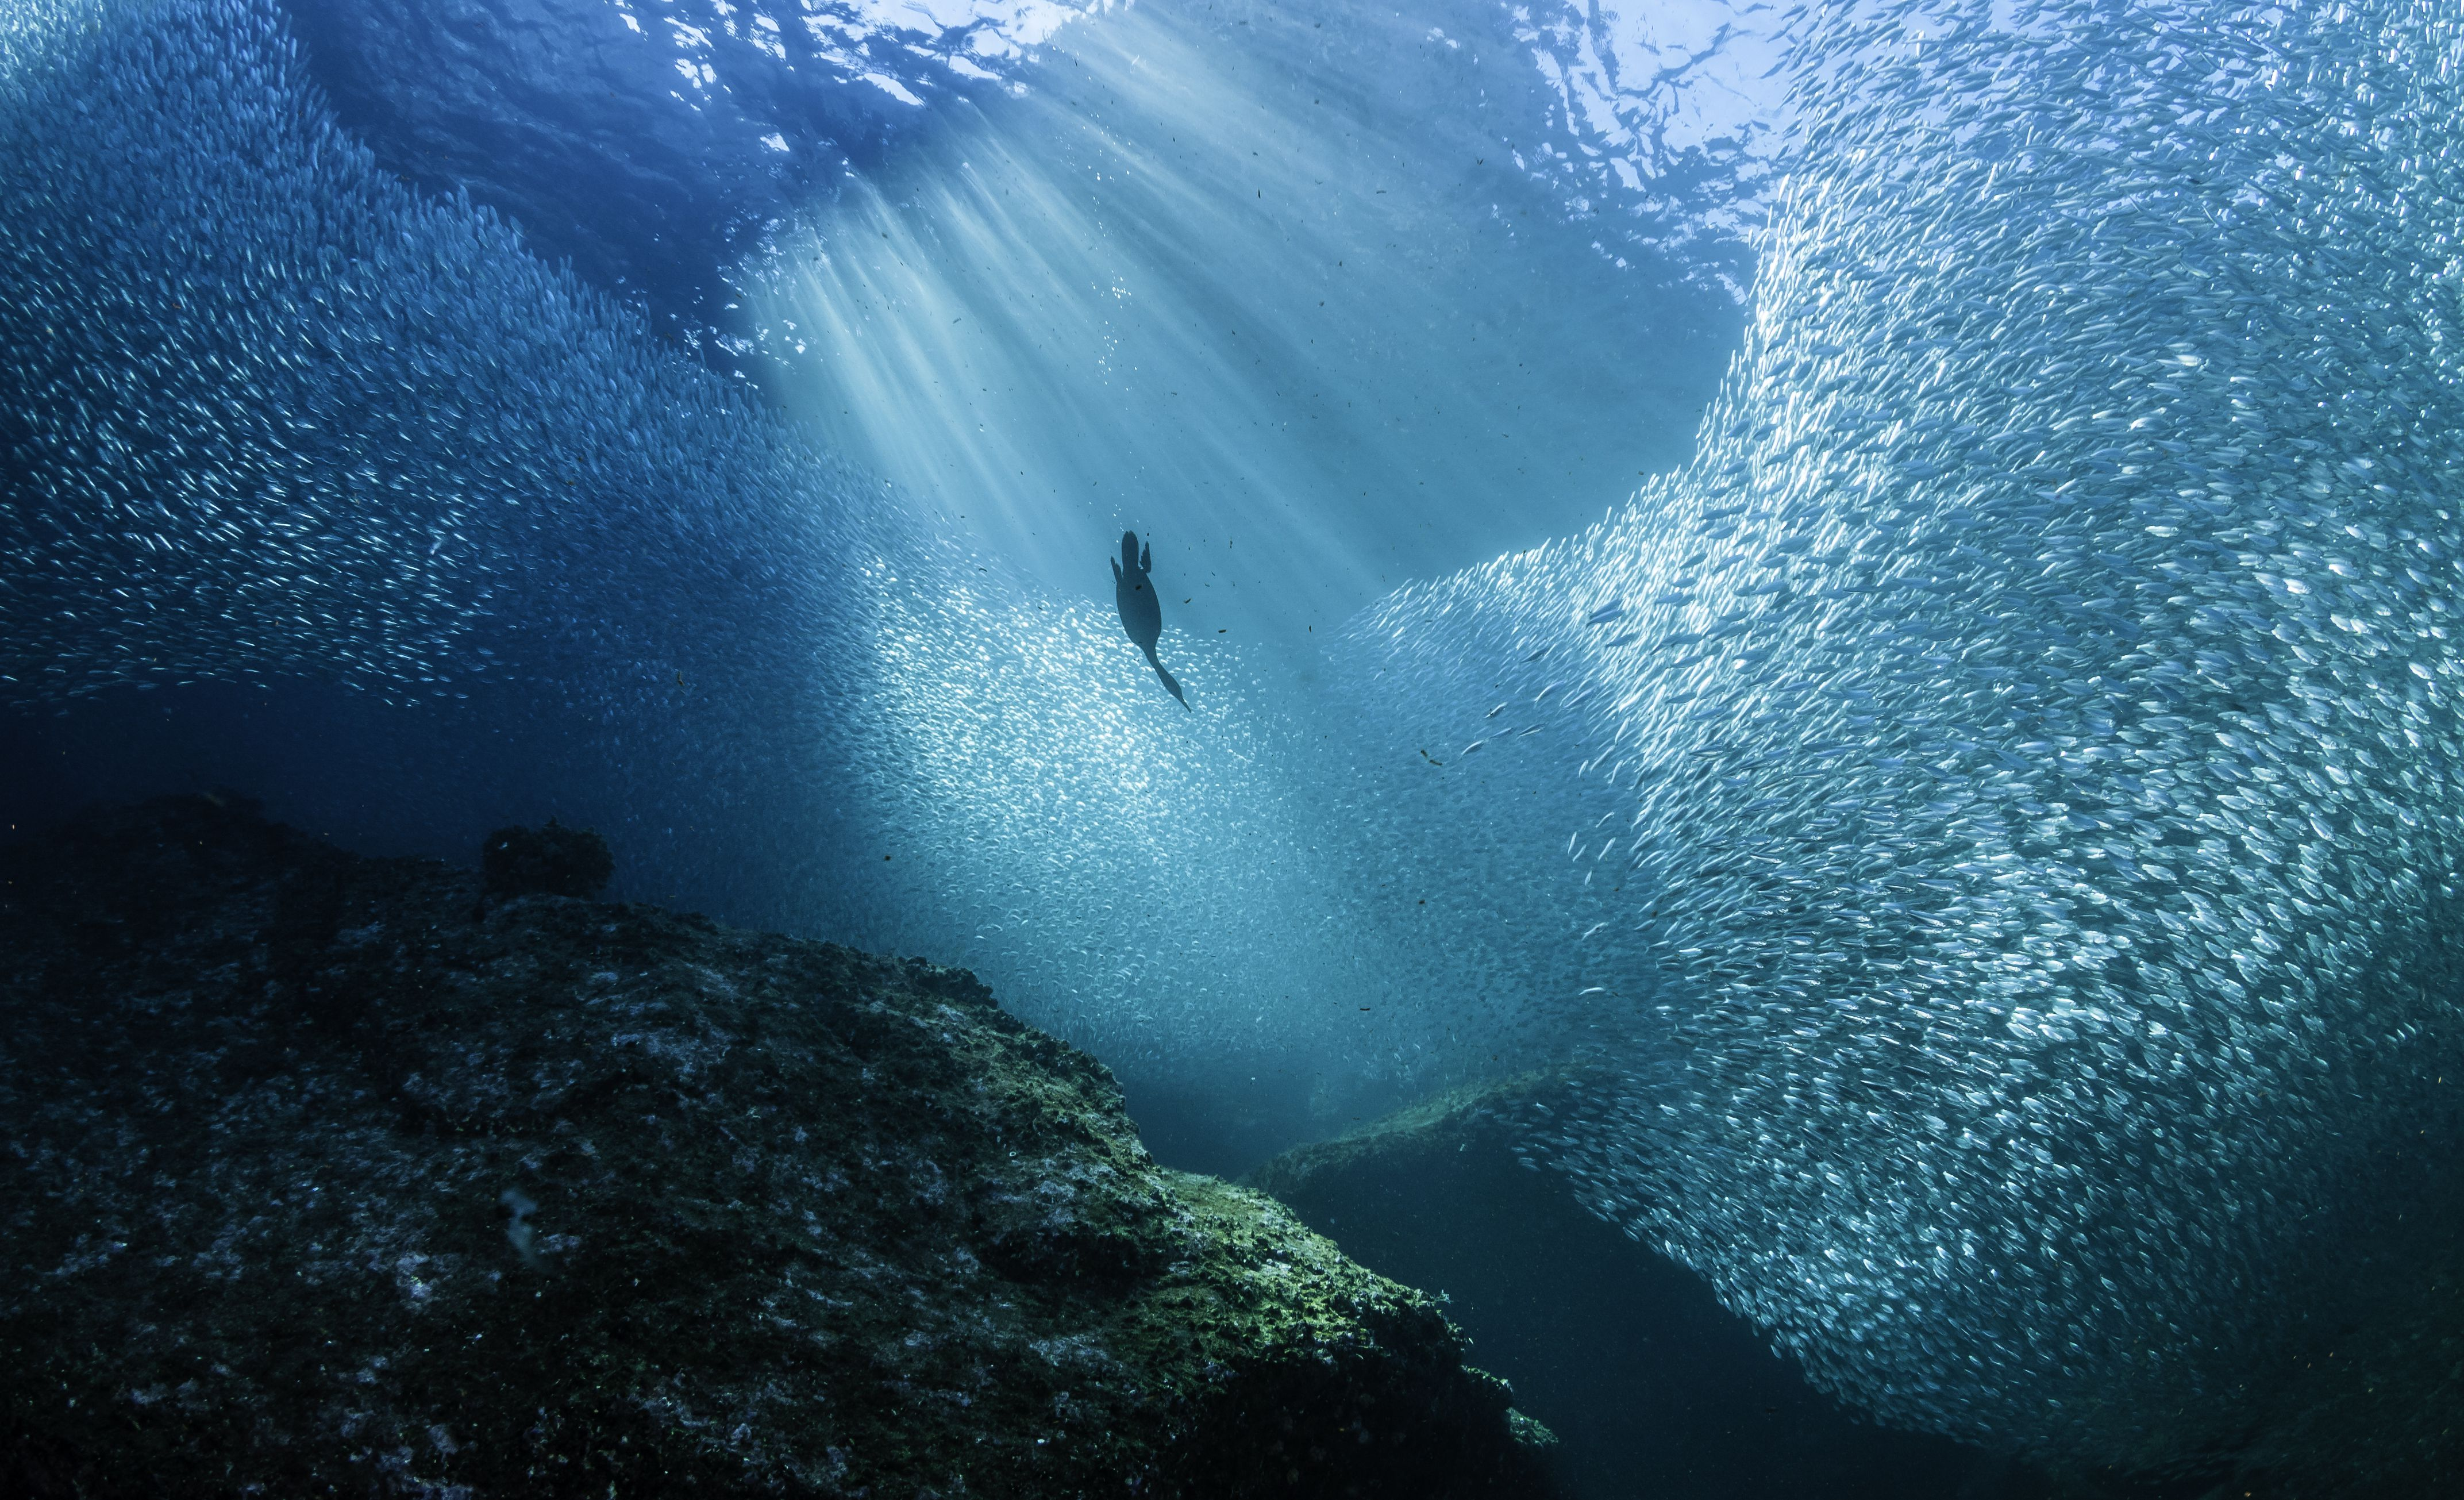 10 threats to ocean life